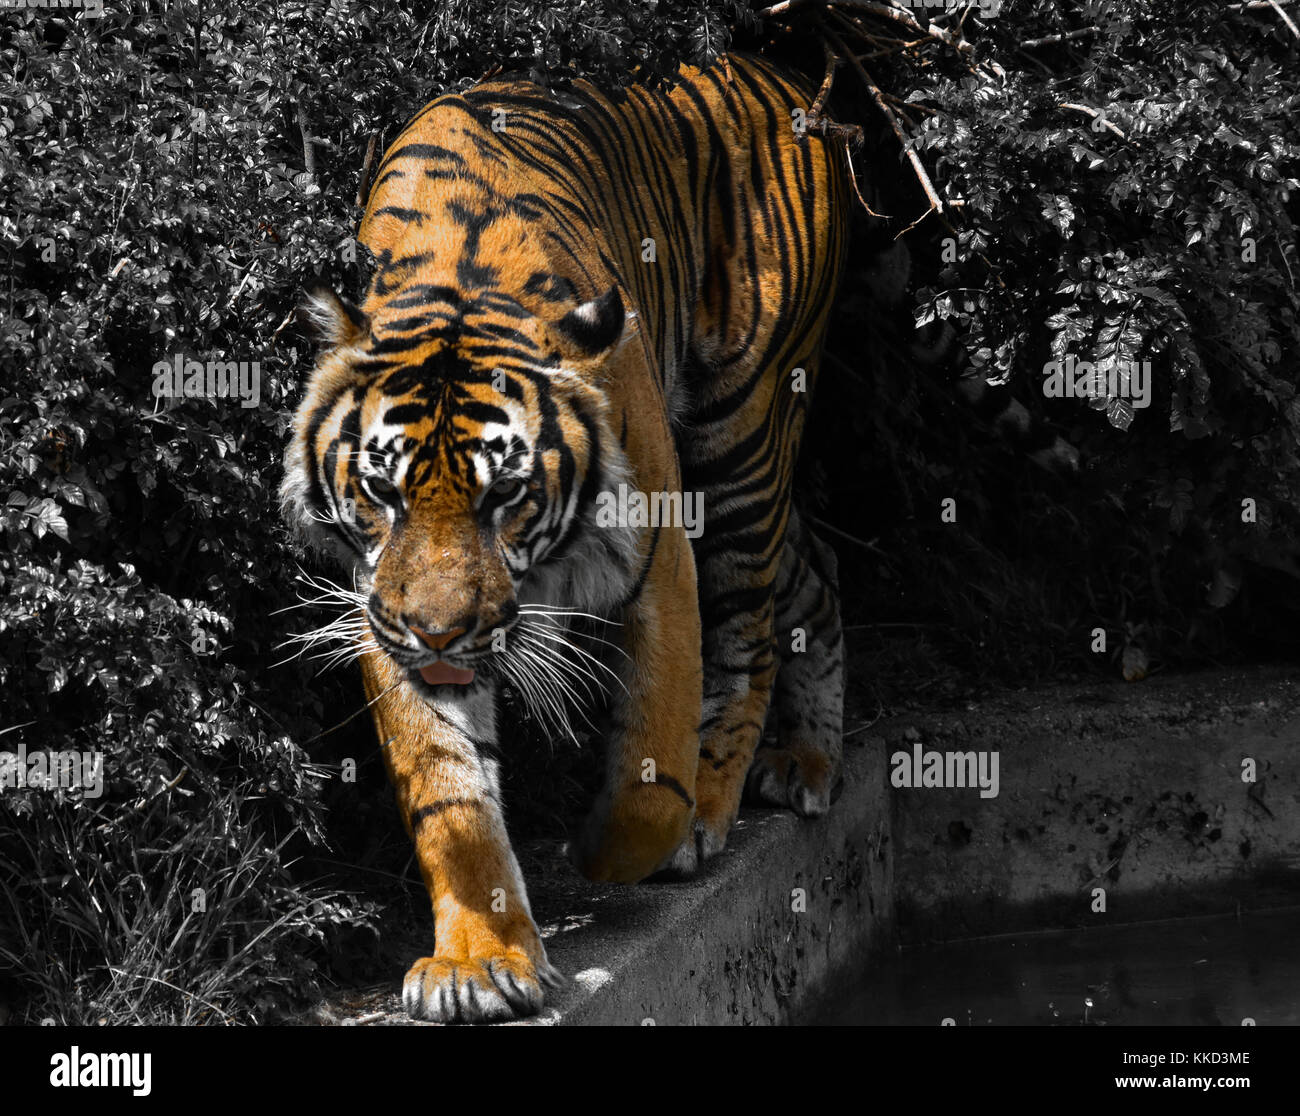 Black, White, and Orange - Stock Image